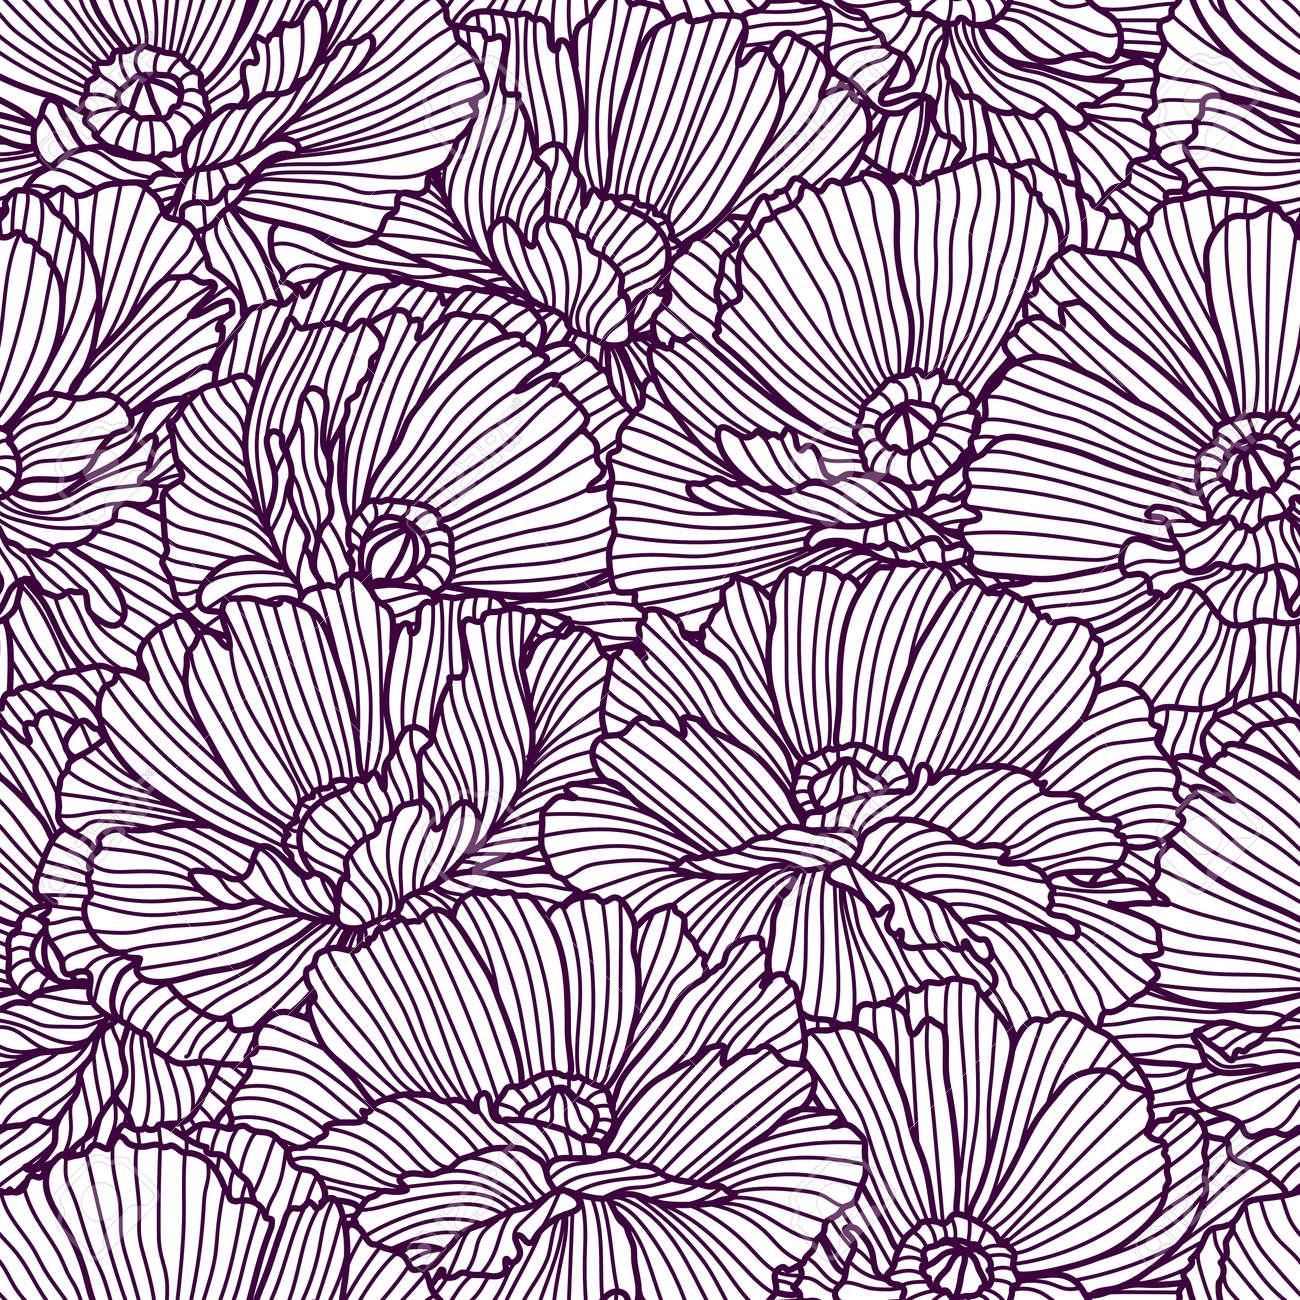 Seamless pattern with poppies. Beautiful decorative stylized summer flowers. - 158328084